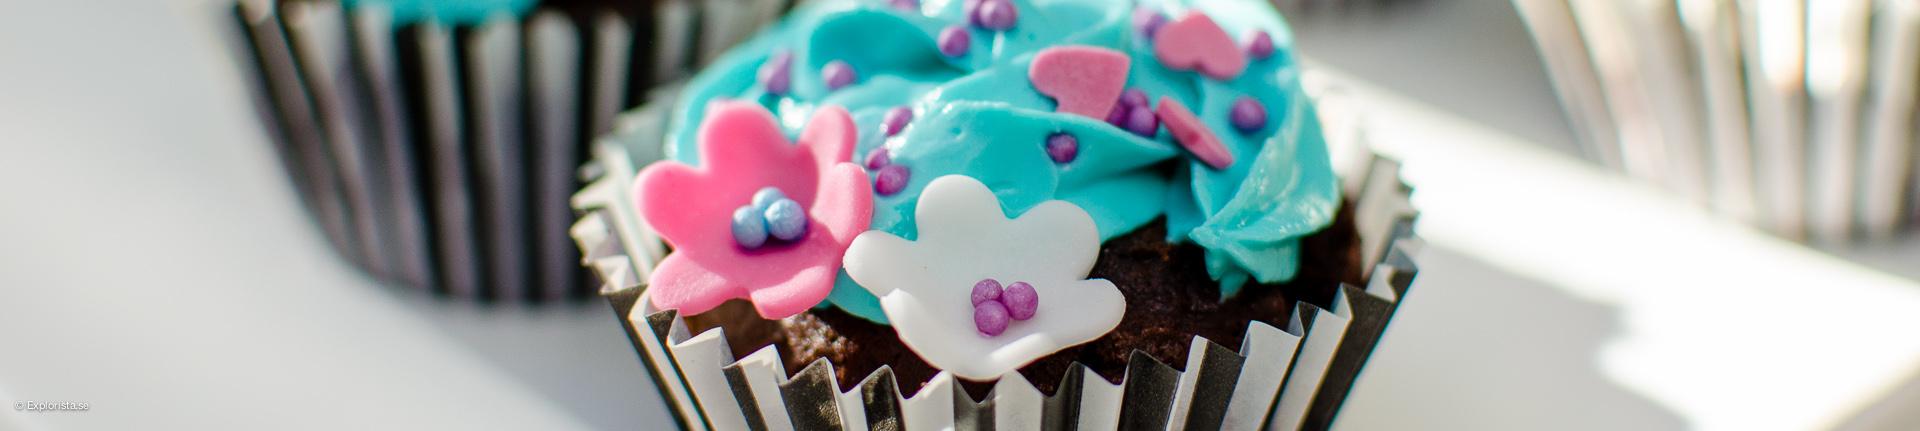 blå chokladcupcake